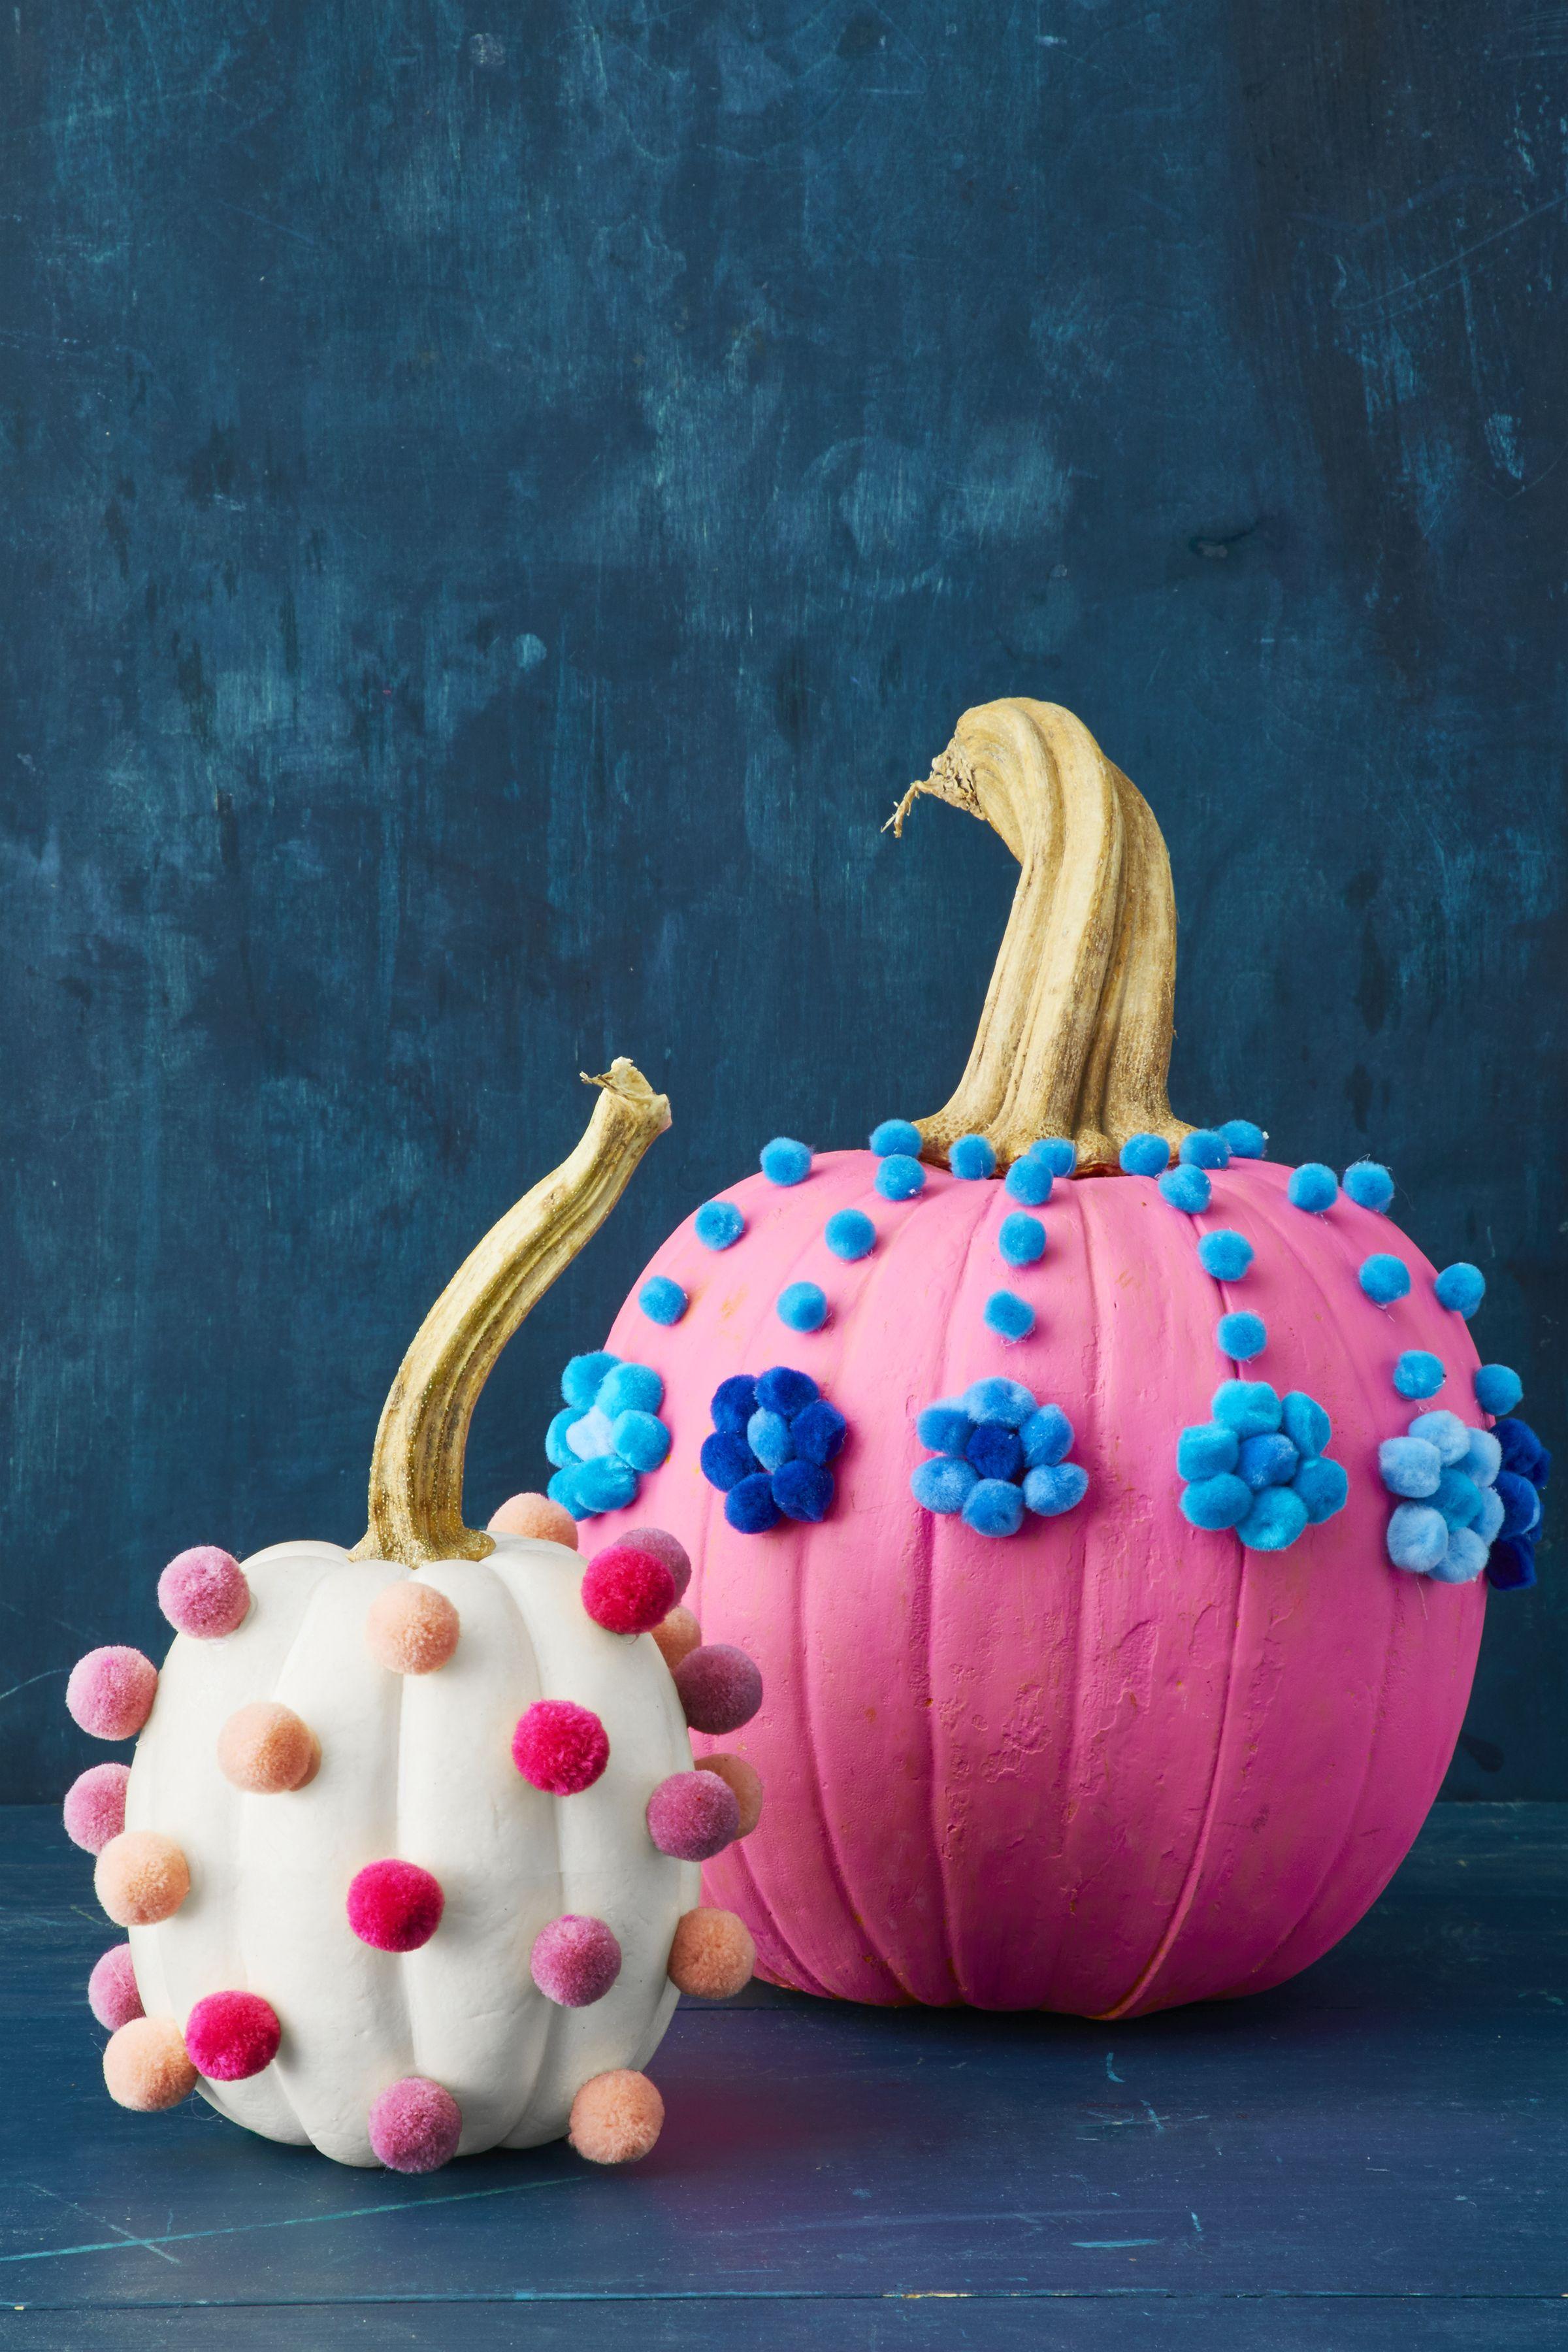 60+ Best No,Carve Pumpkin Decorating Ideas for Halloween 2019